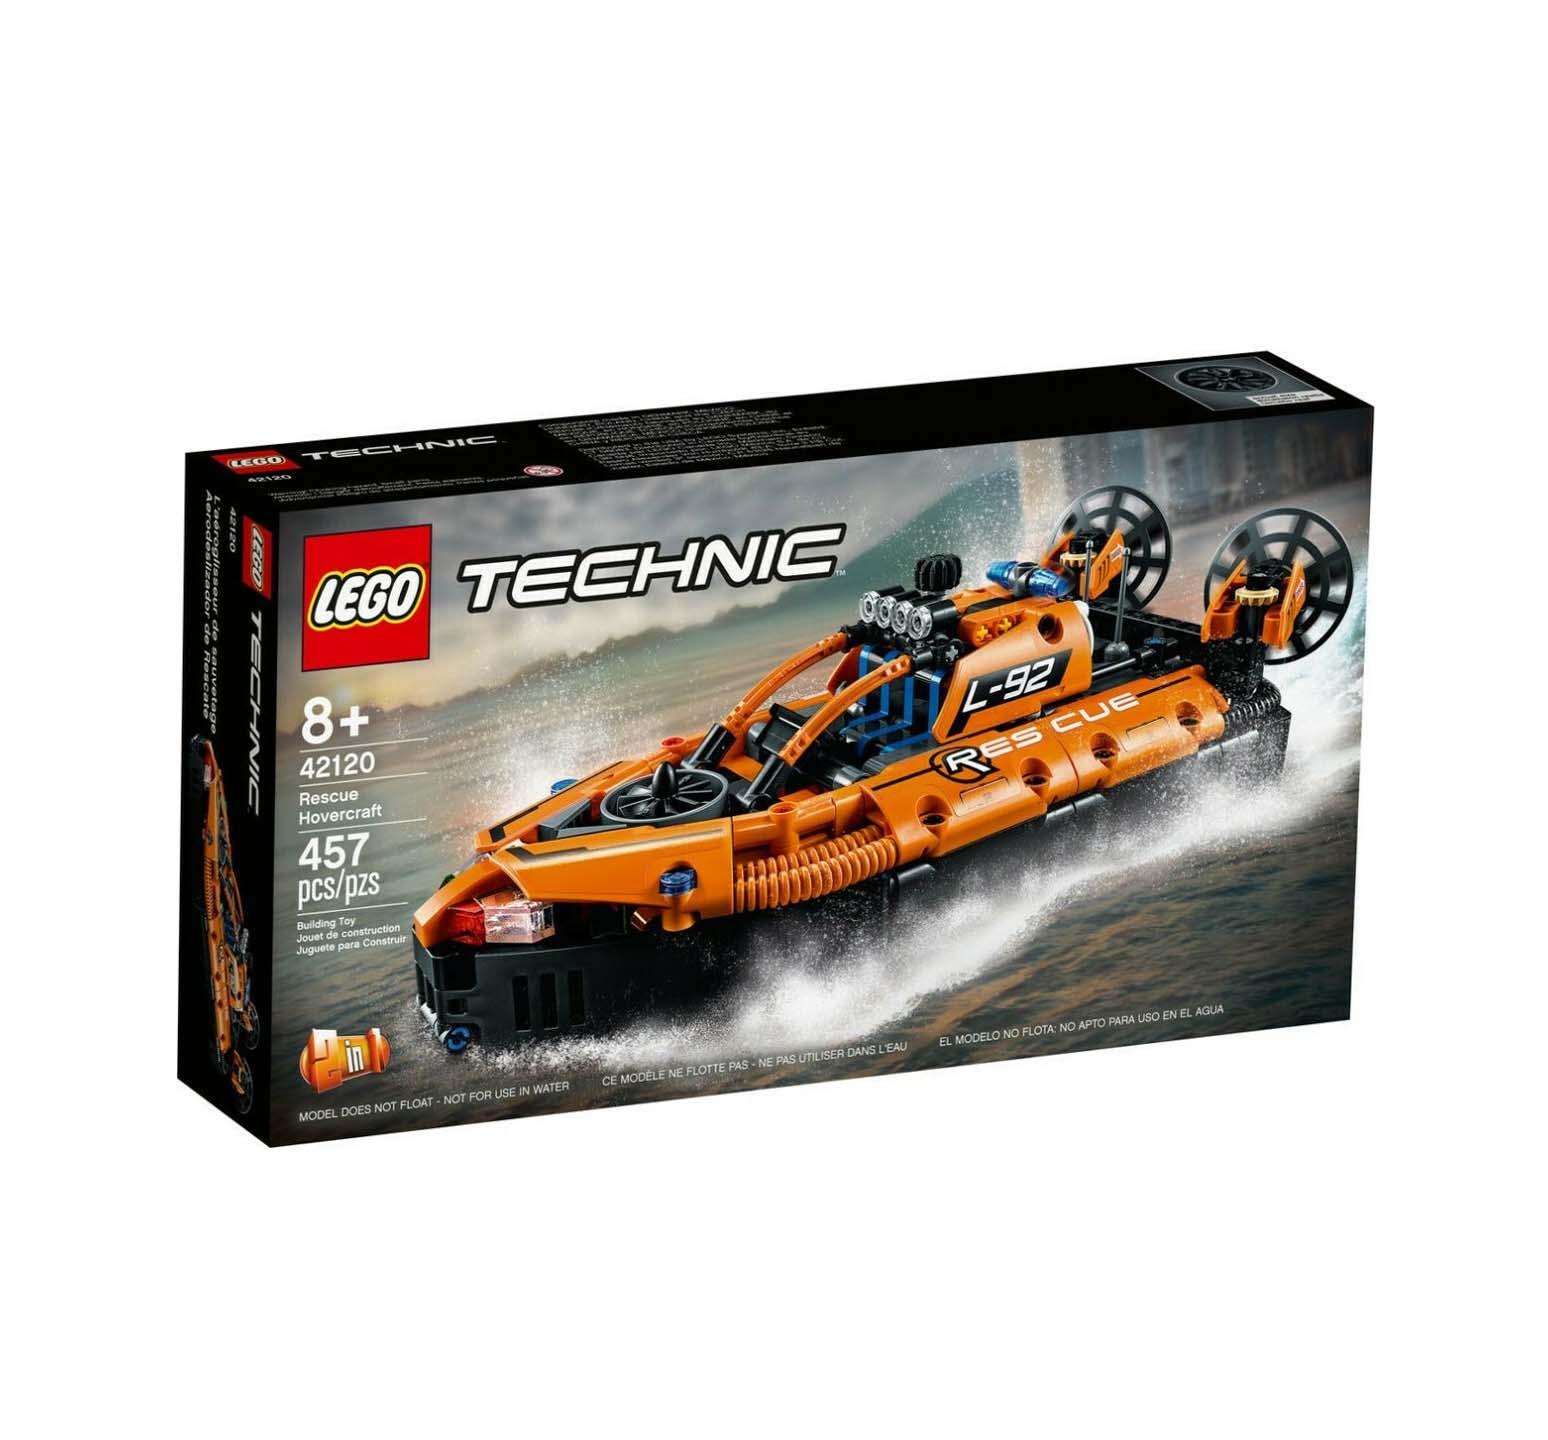 Lego Technic: Rescue Hovercraft 42120